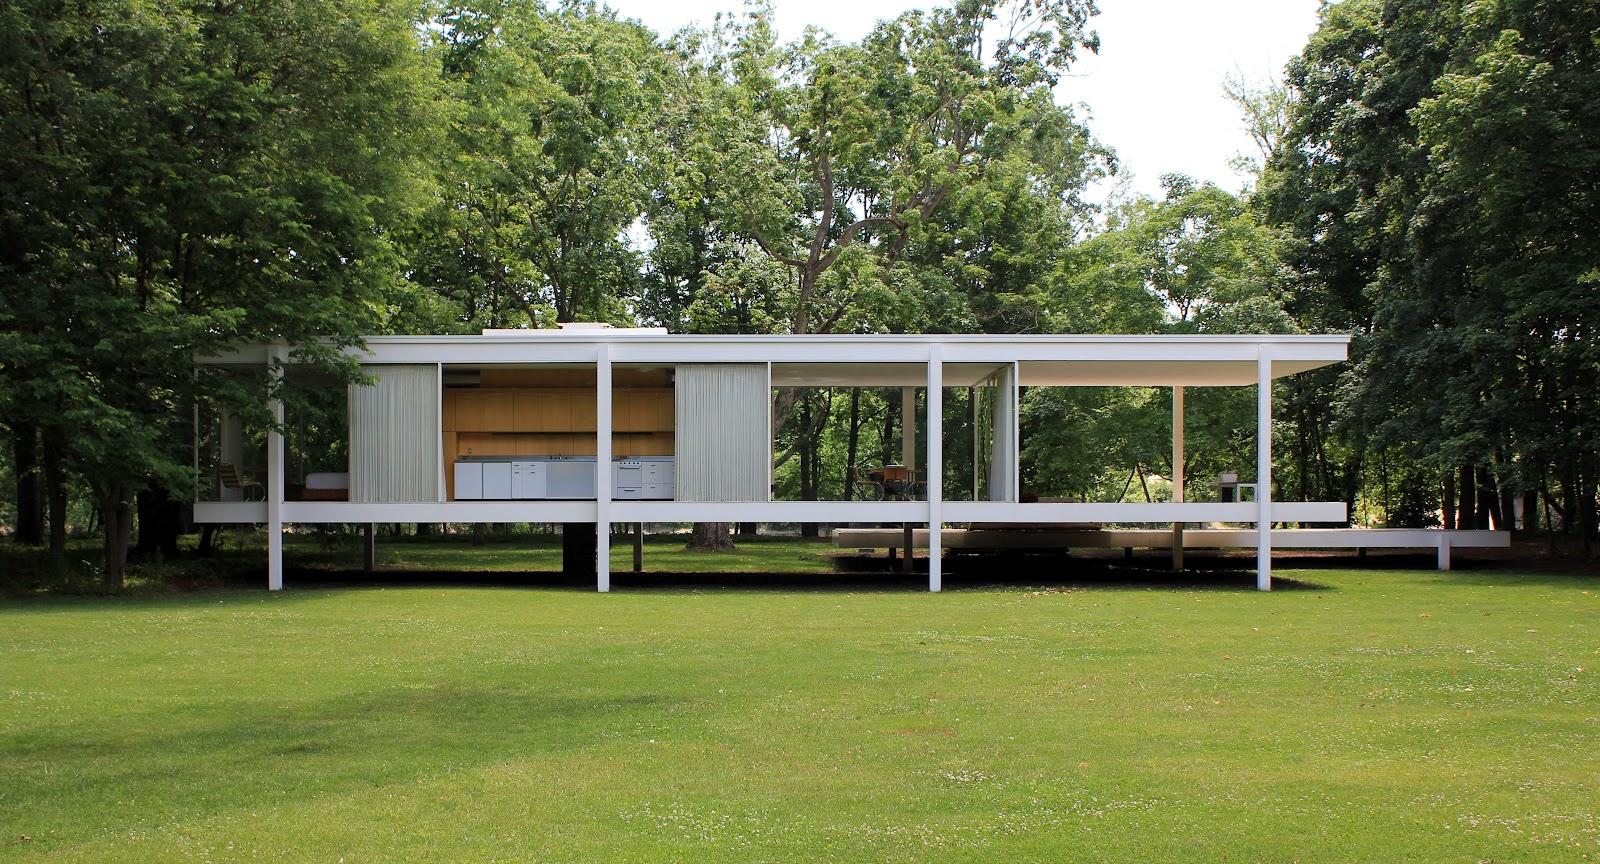 Villa tugendhat arkitalker mies van der rohe - The Farnsworth House Ludwig Mies Van Der Rohe 1945 51 Individual Houses Pinterest